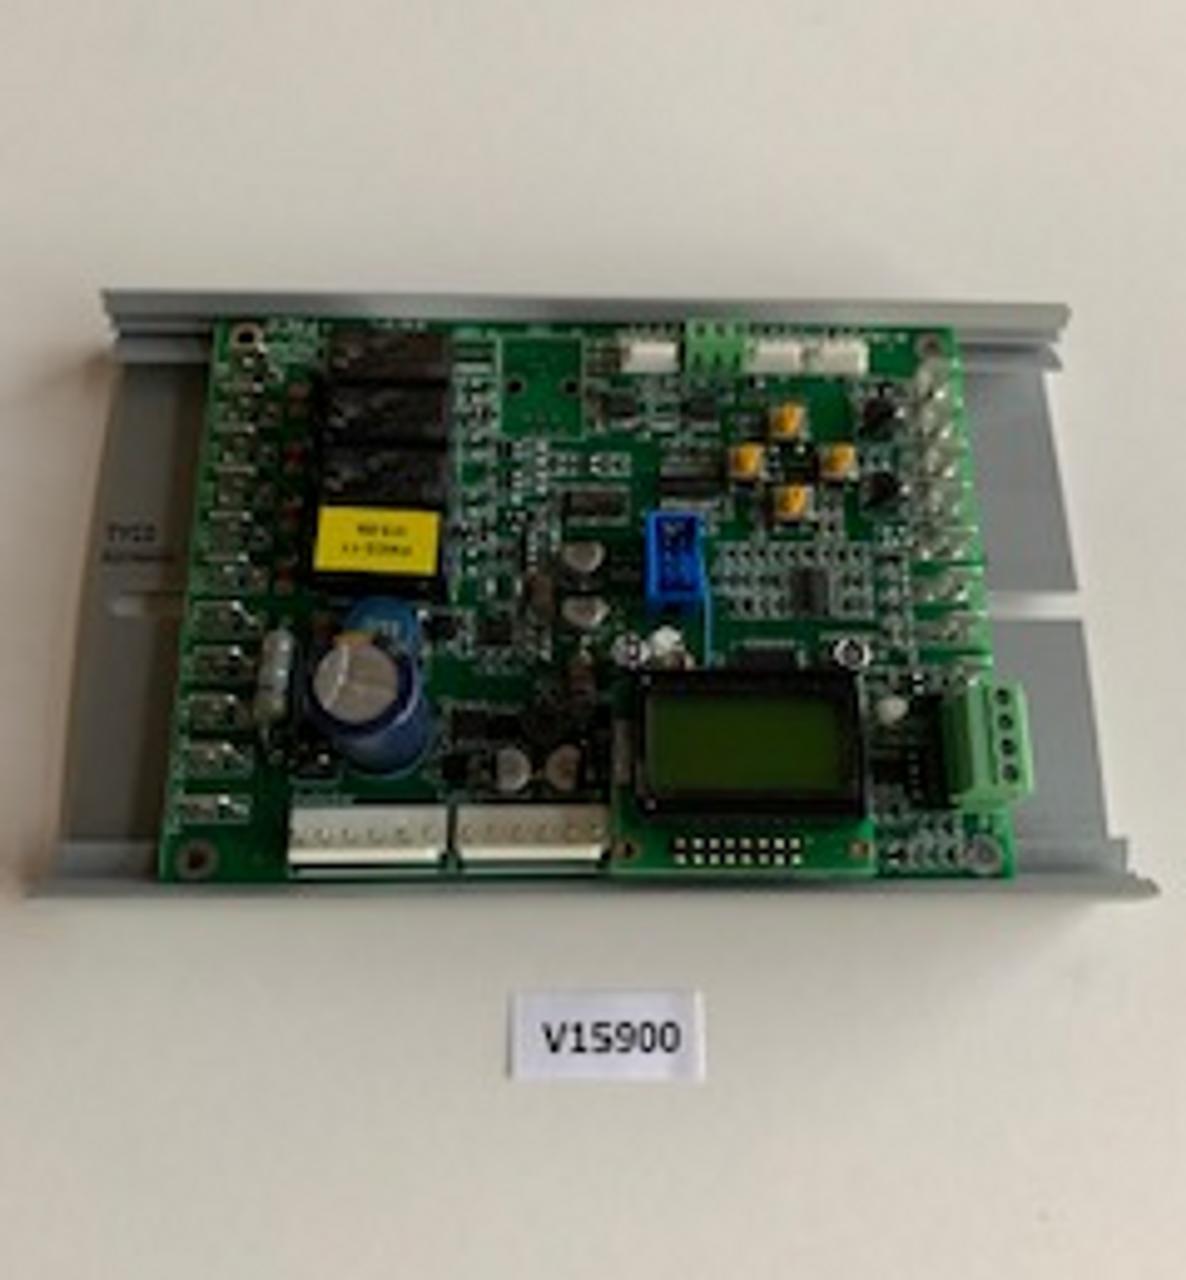 Control, Board Mod Gas + Relays, Aaon, V51900